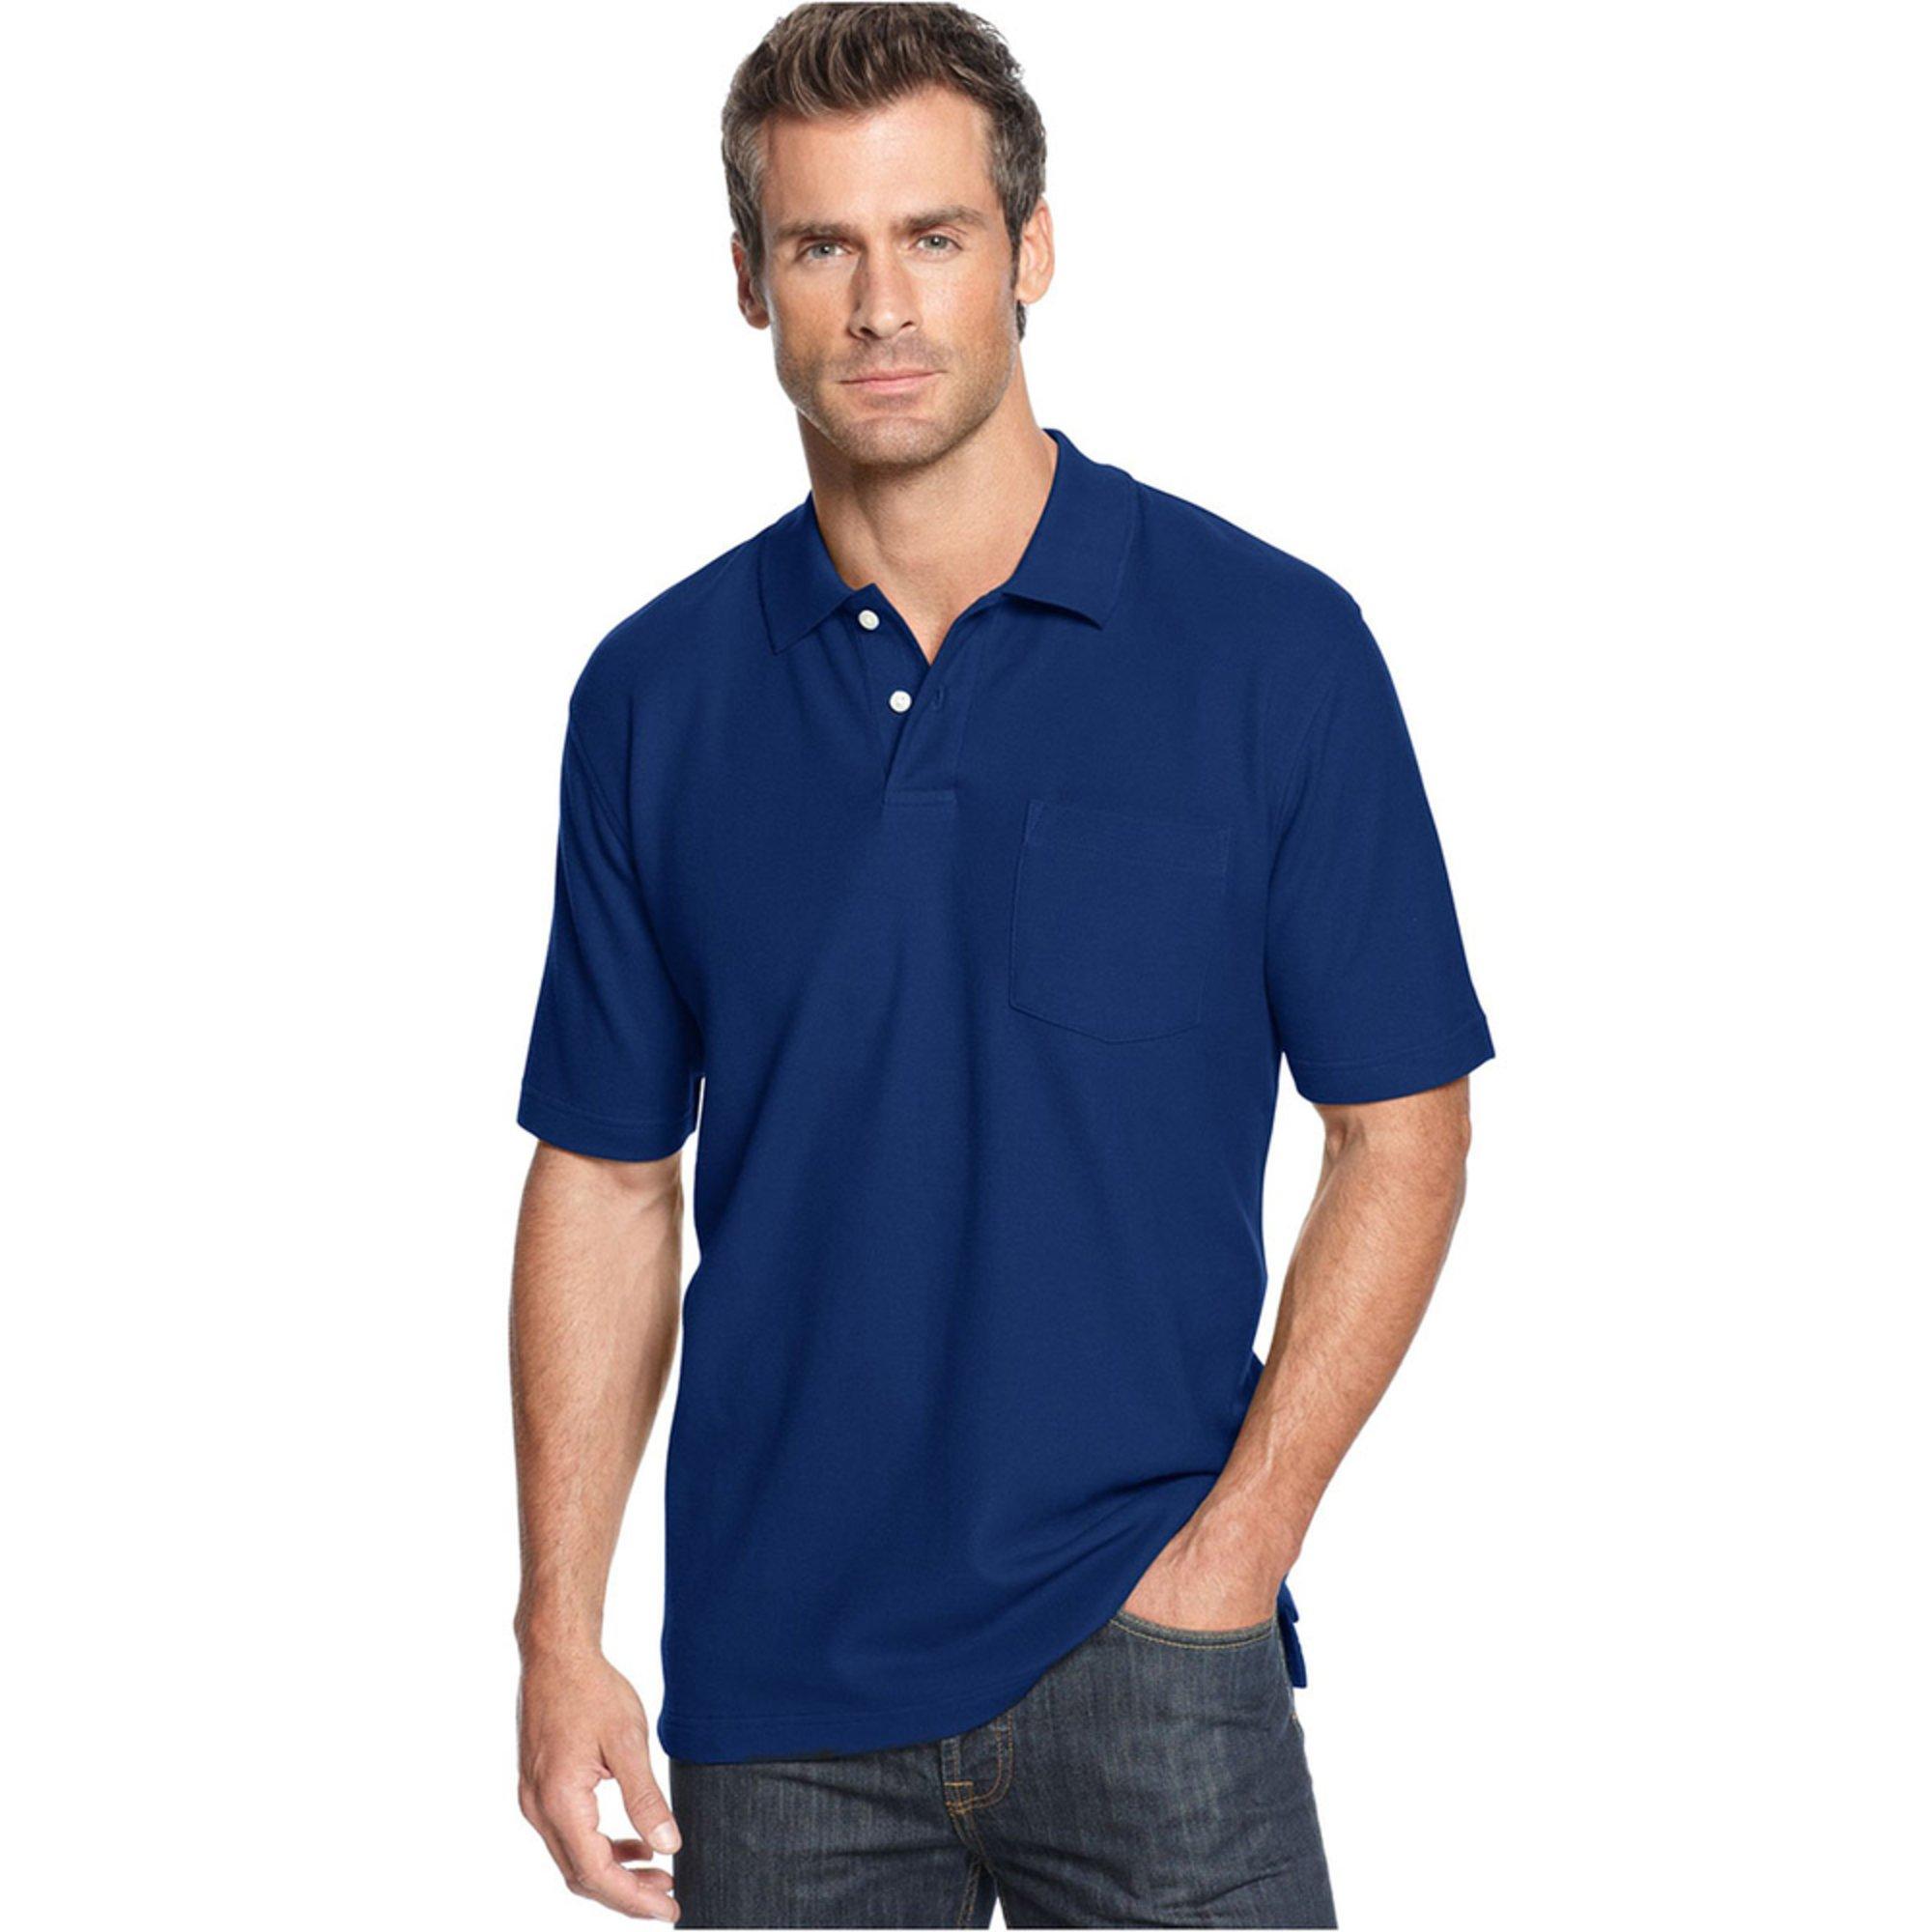 John Ashford Men's Navy Blue Short Sleeve Solid Polo With ...